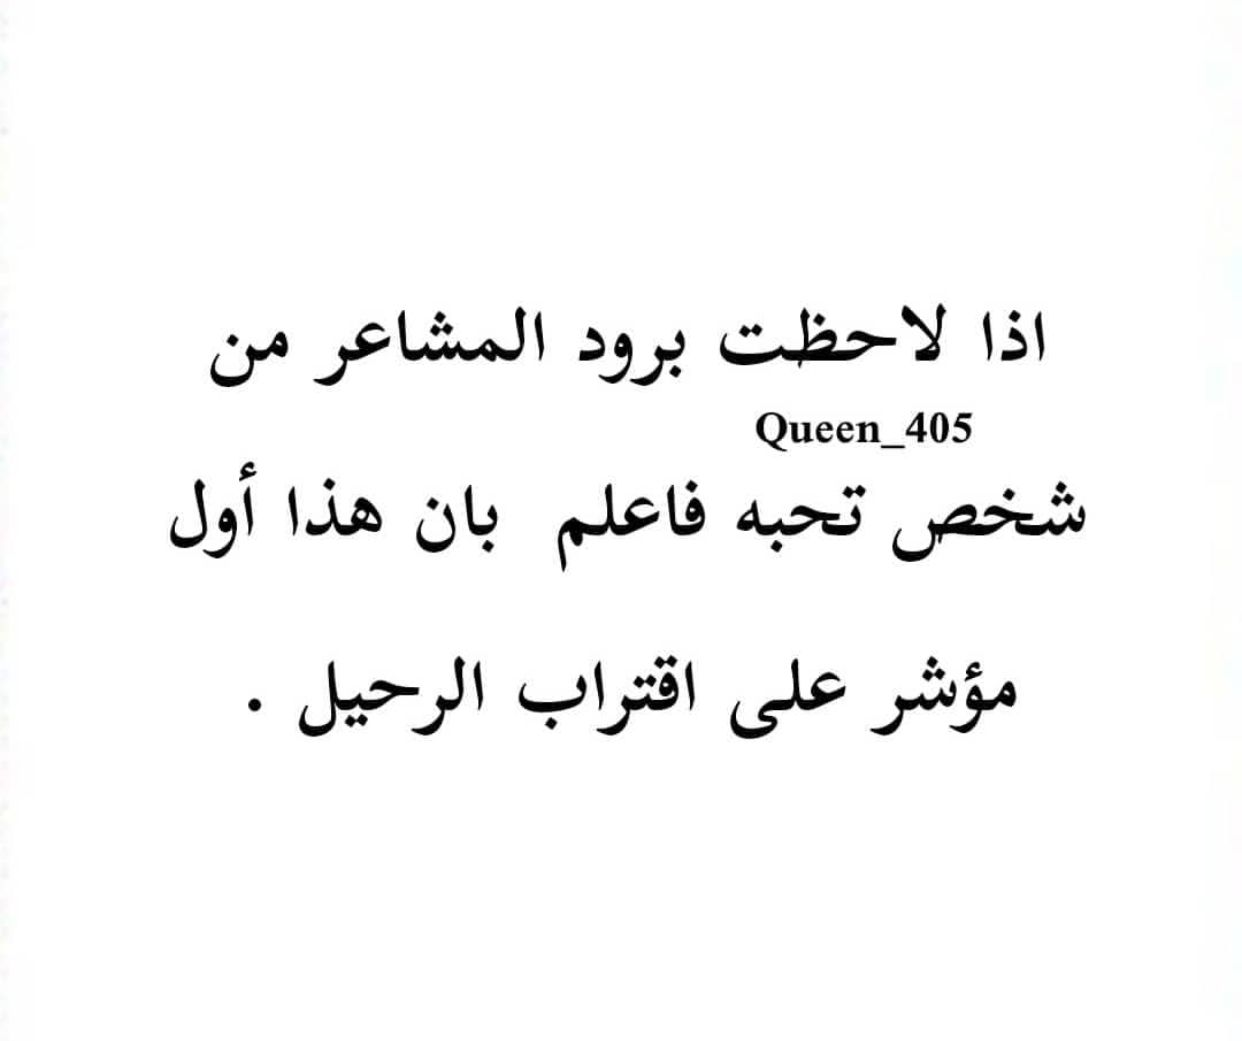 Pin By بنت محمد On اقتباسات Watermelon Art Quotes Calligraphy